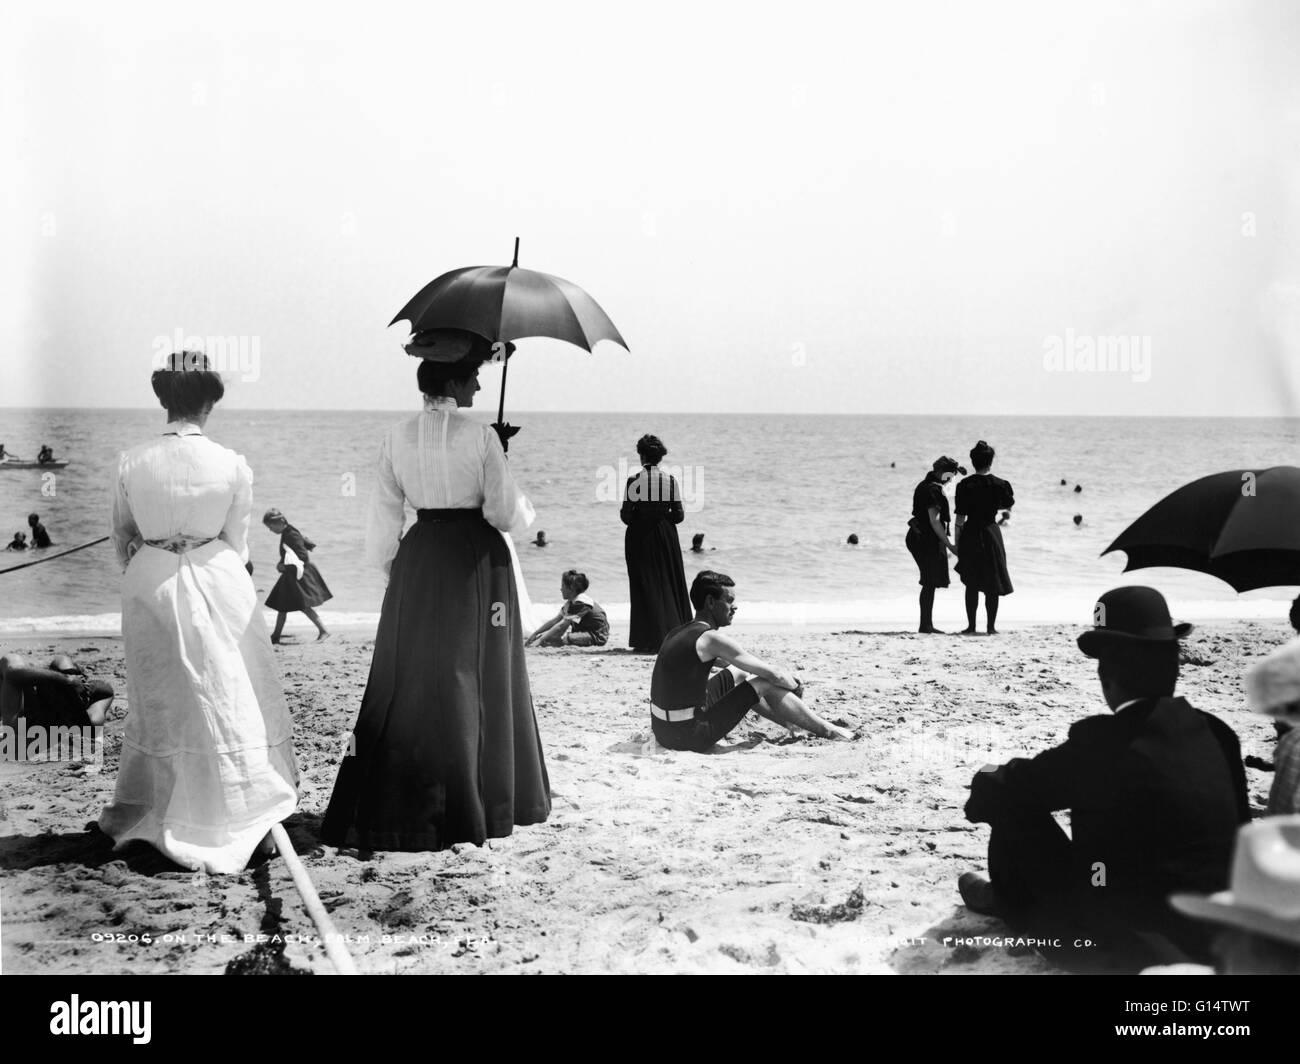 Palm Beach circa 1900 - 1906. - Stock Image